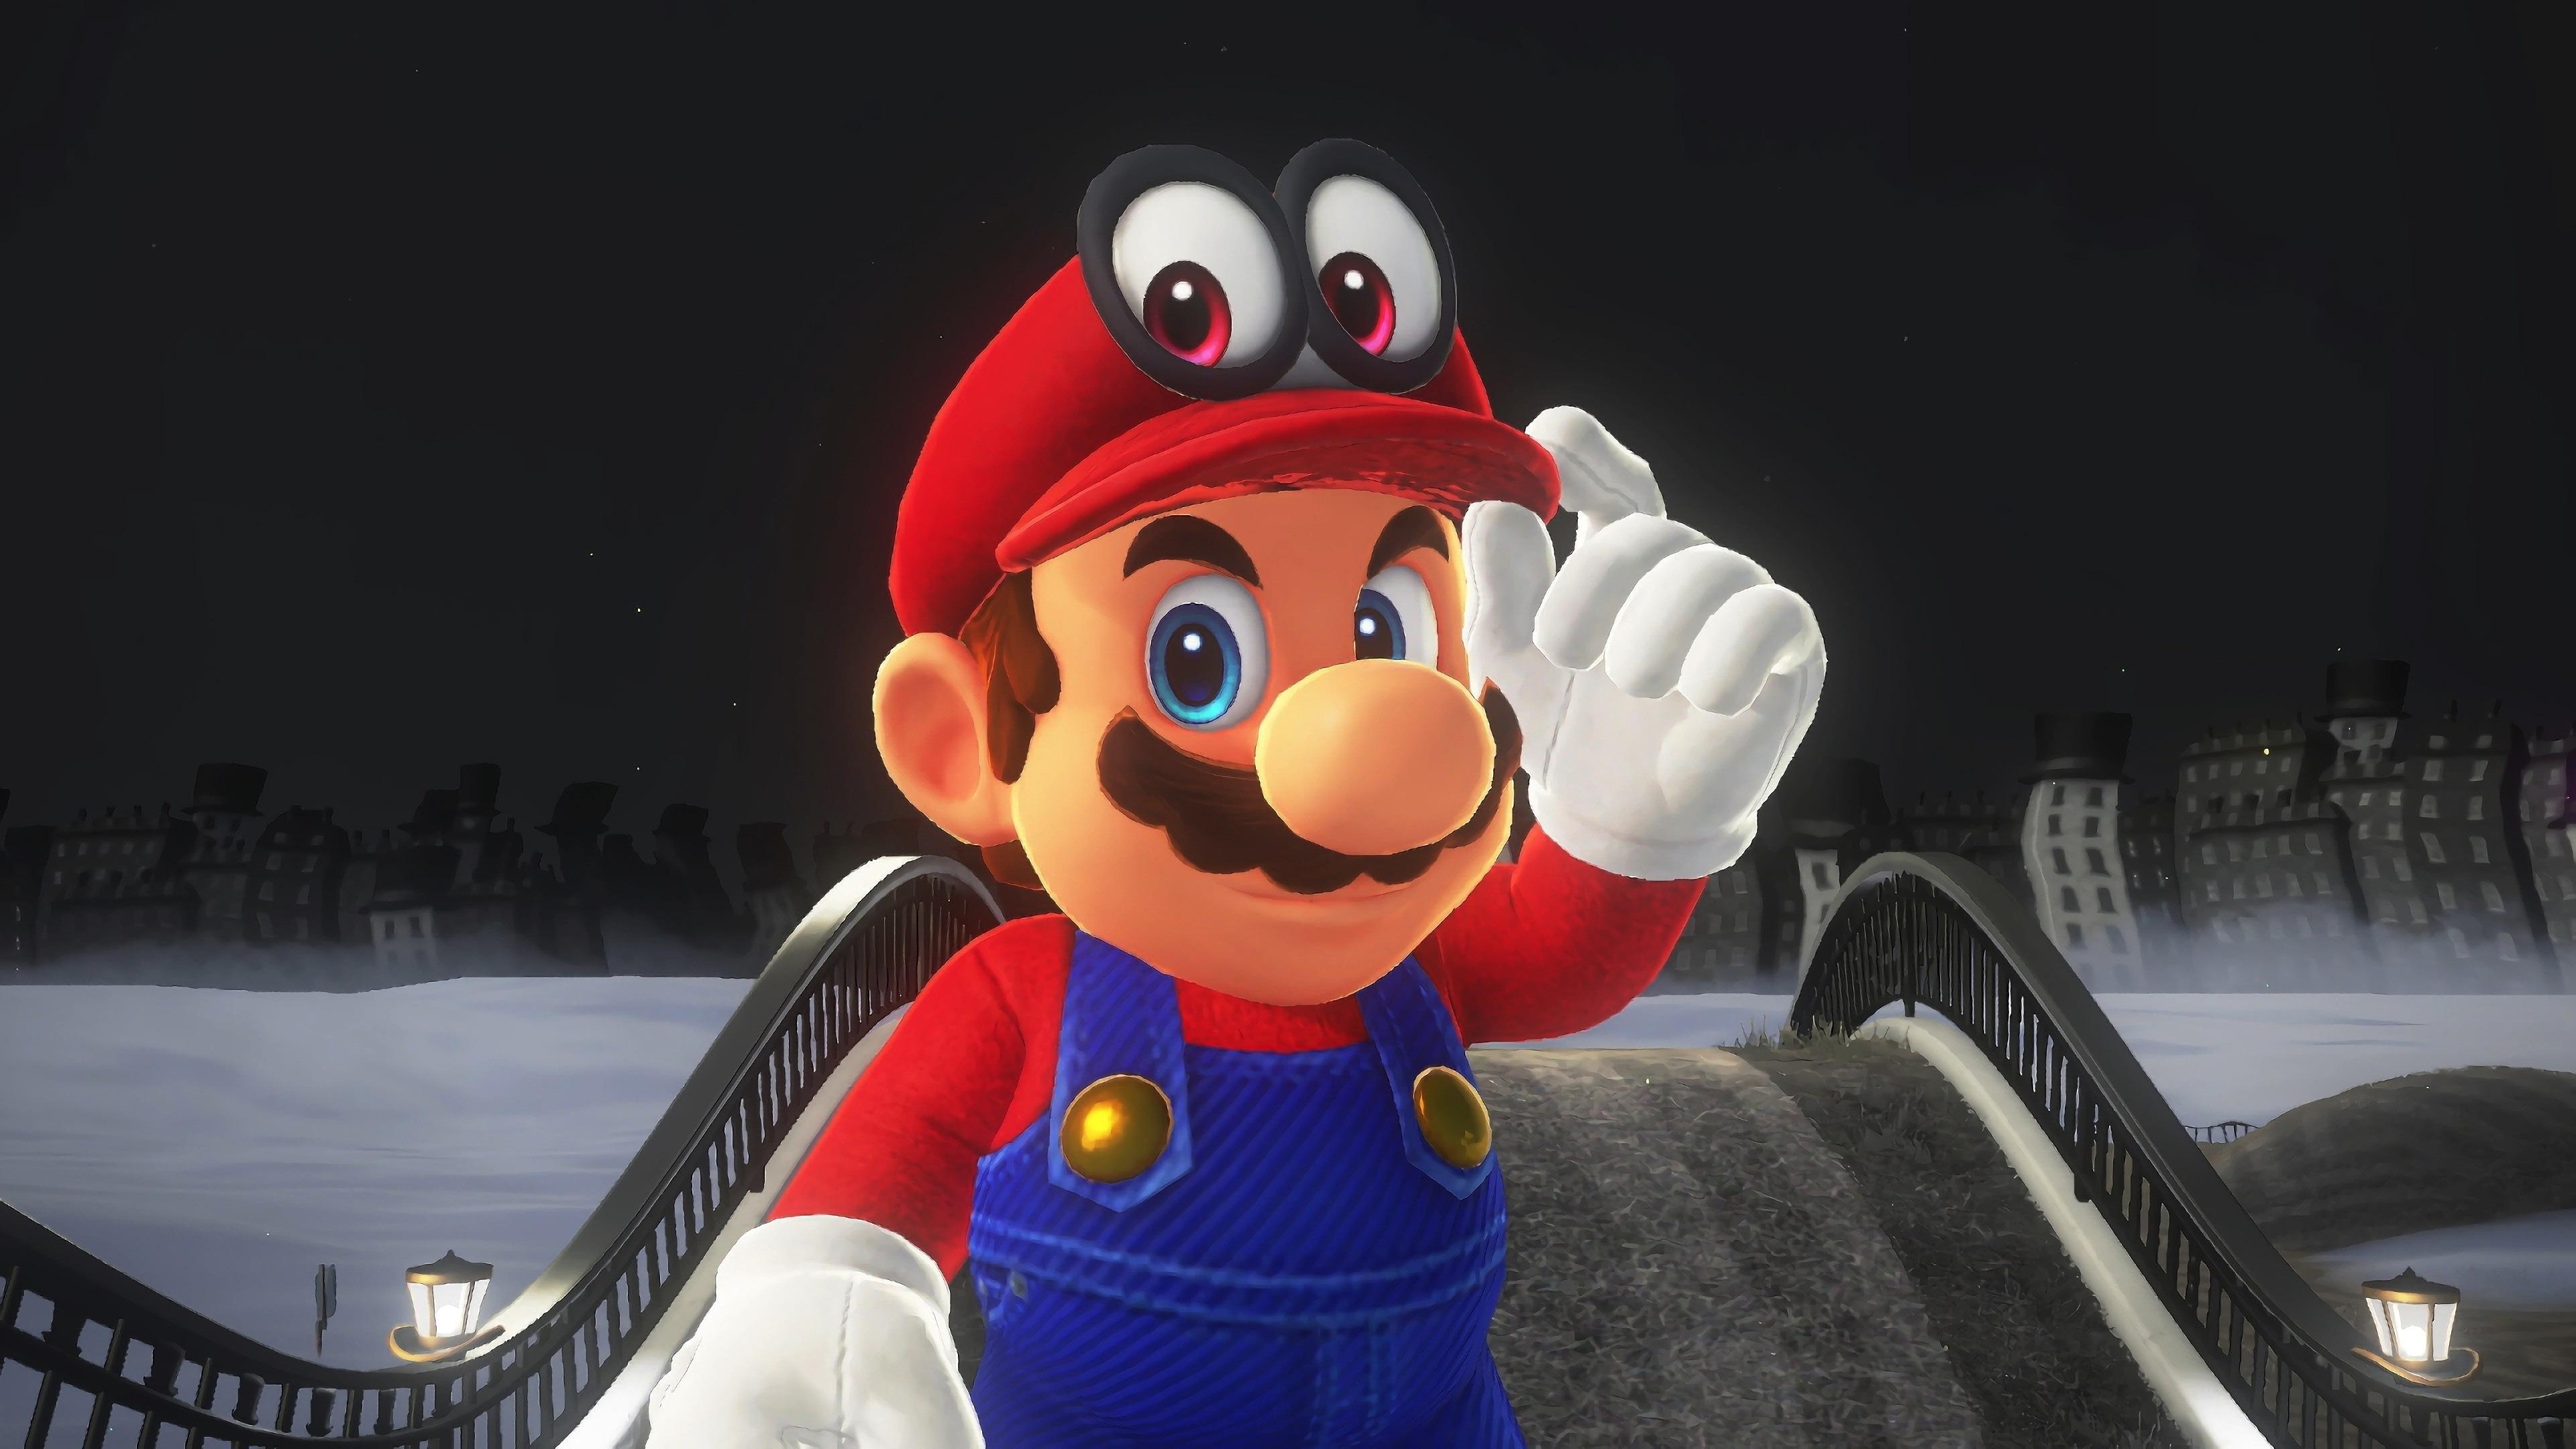 Download 3840x2400 Wallpaper Mario Super Mario Odyssey Video Game